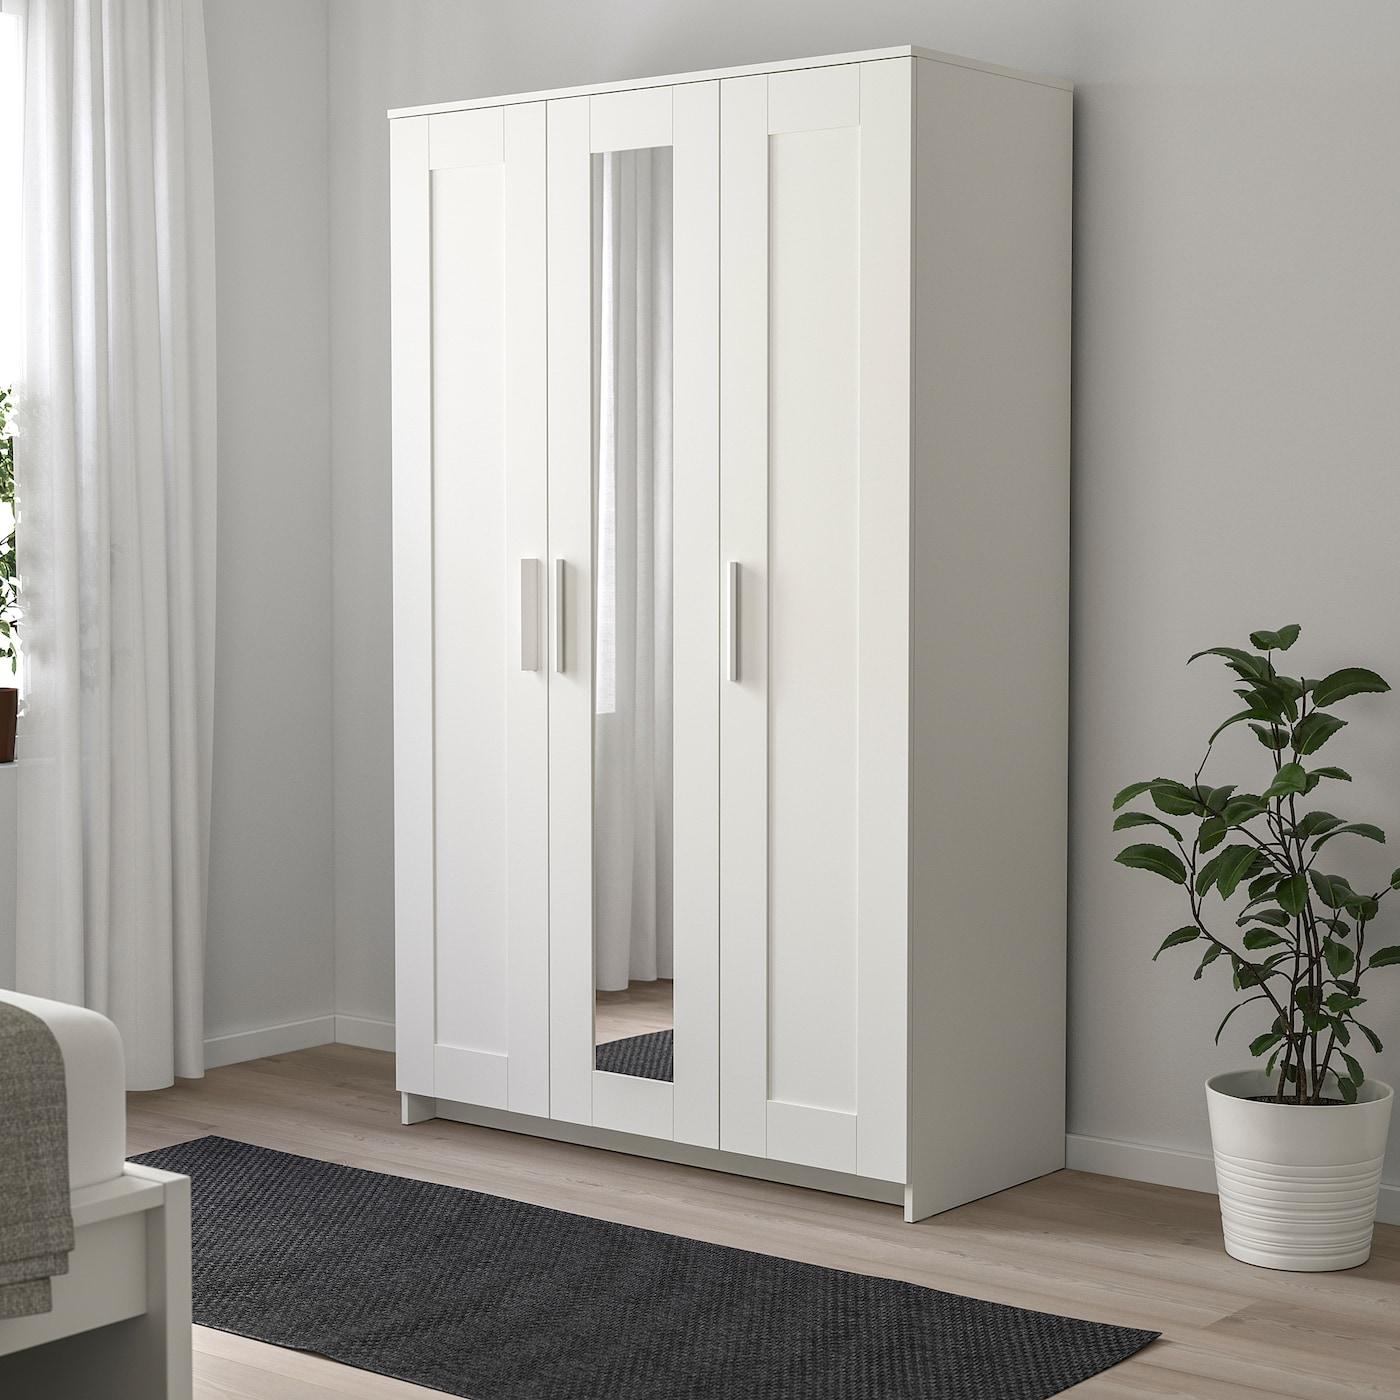 Armadio 3 Ante Ikea.Brimnes Wardrobe With 3 Doors White 46x74 3 4 Ikea